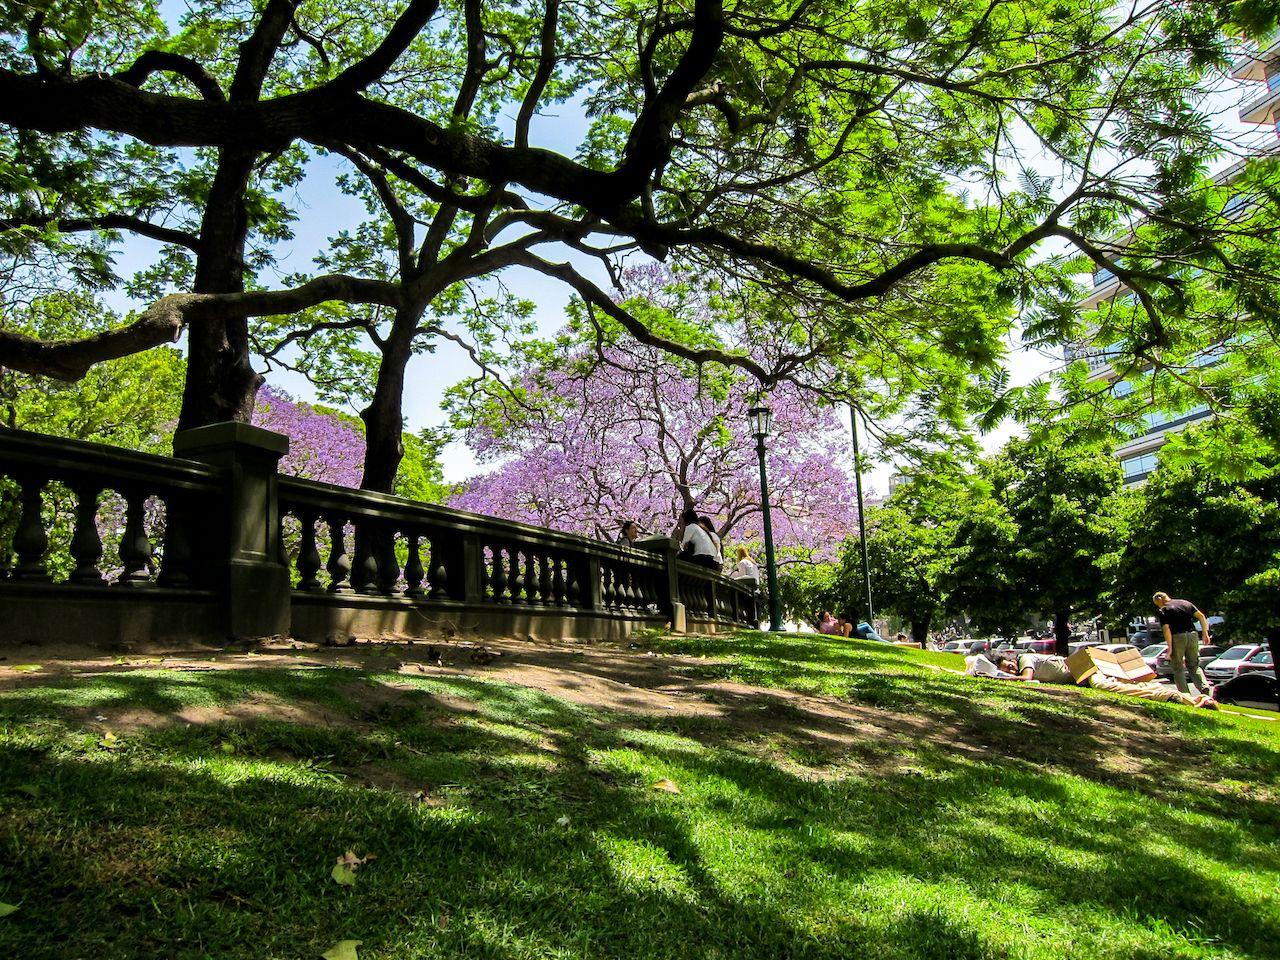 Jacaranda tree in full bloom on Plaza San Martin in Buenos Aires, Argentina